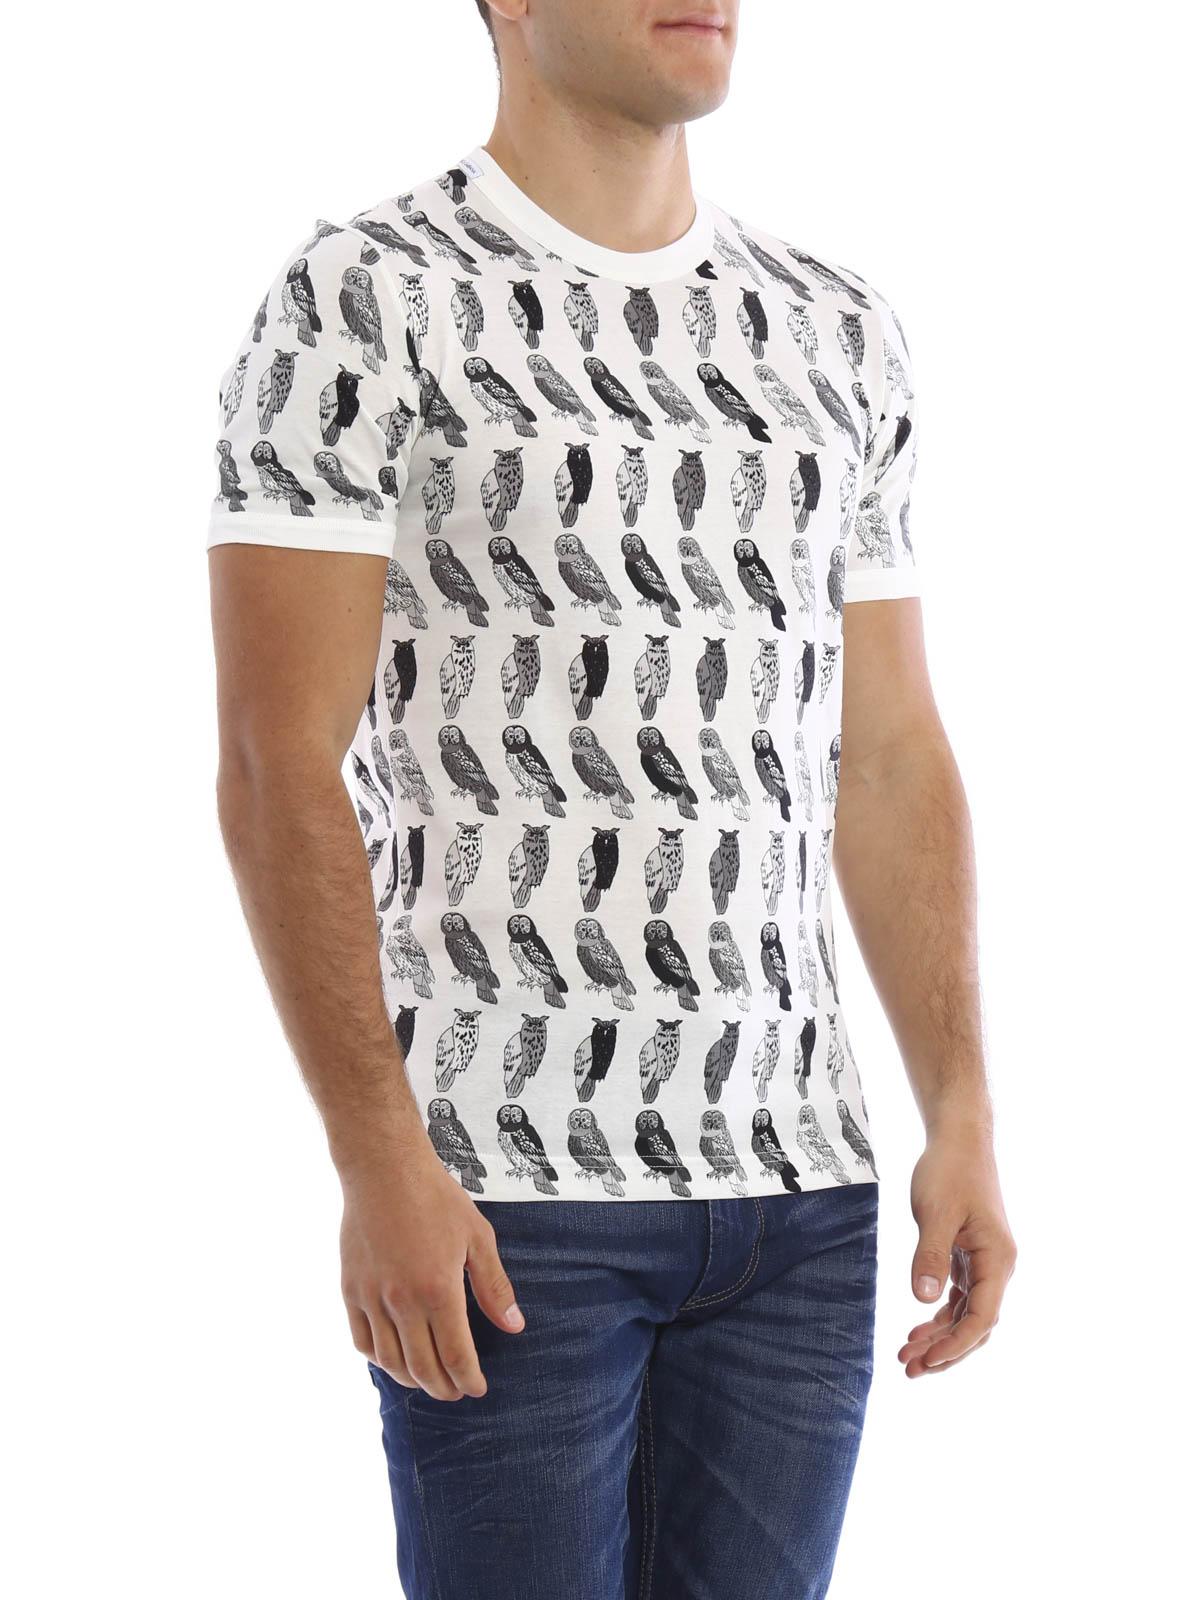 dolce gabbana owls print t shirt t shirts g8fv4t g7gios9000. Black Bedroom Furniture Sets. Home Design Ideas